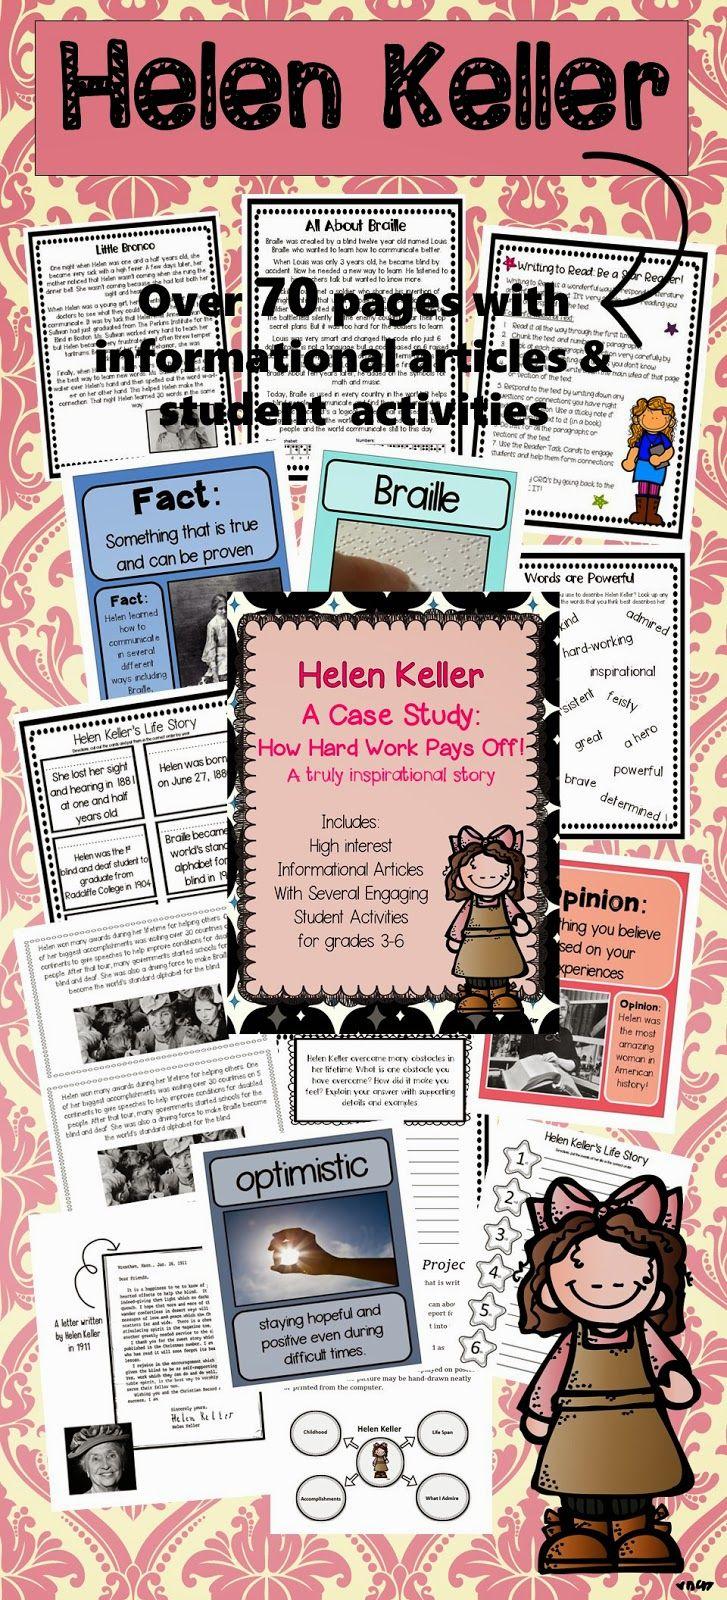 helen keller s heroic journey My personal hero: helen keller i have always been taken by the books of helen keller, for when she had the opportunity to recount her life's journey.